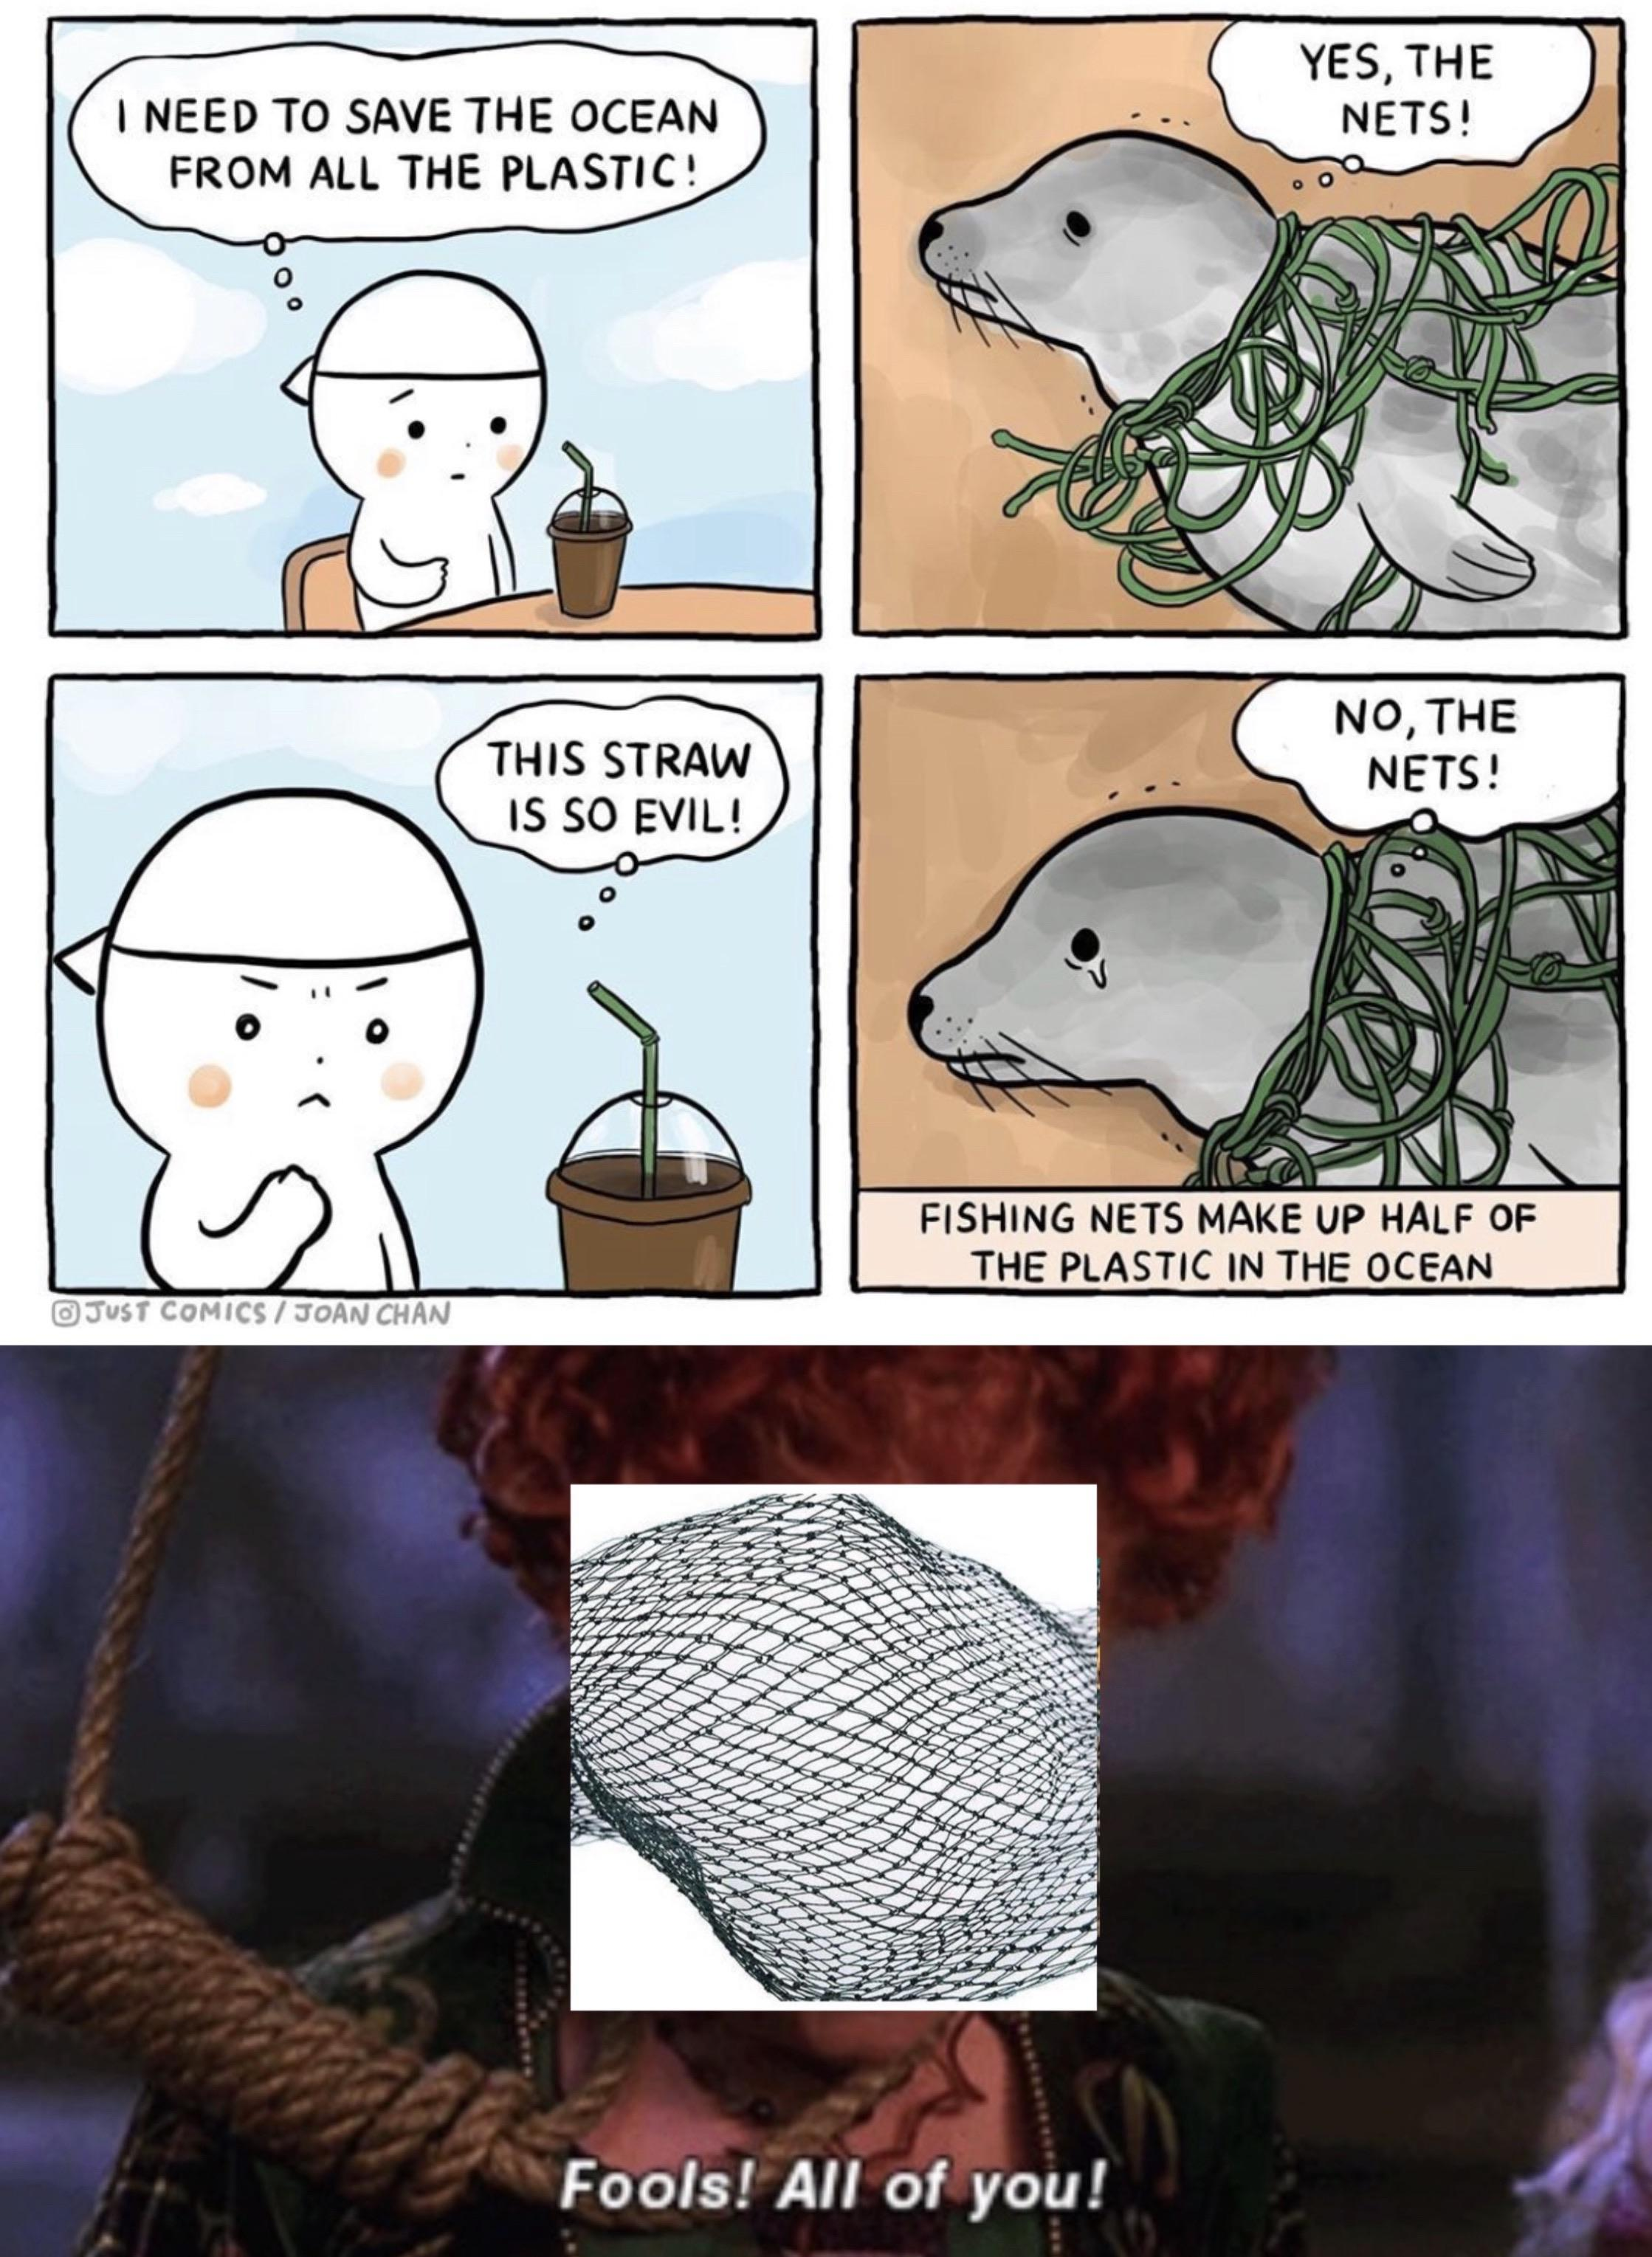 Straws Bad Fish Nets Badder Memes